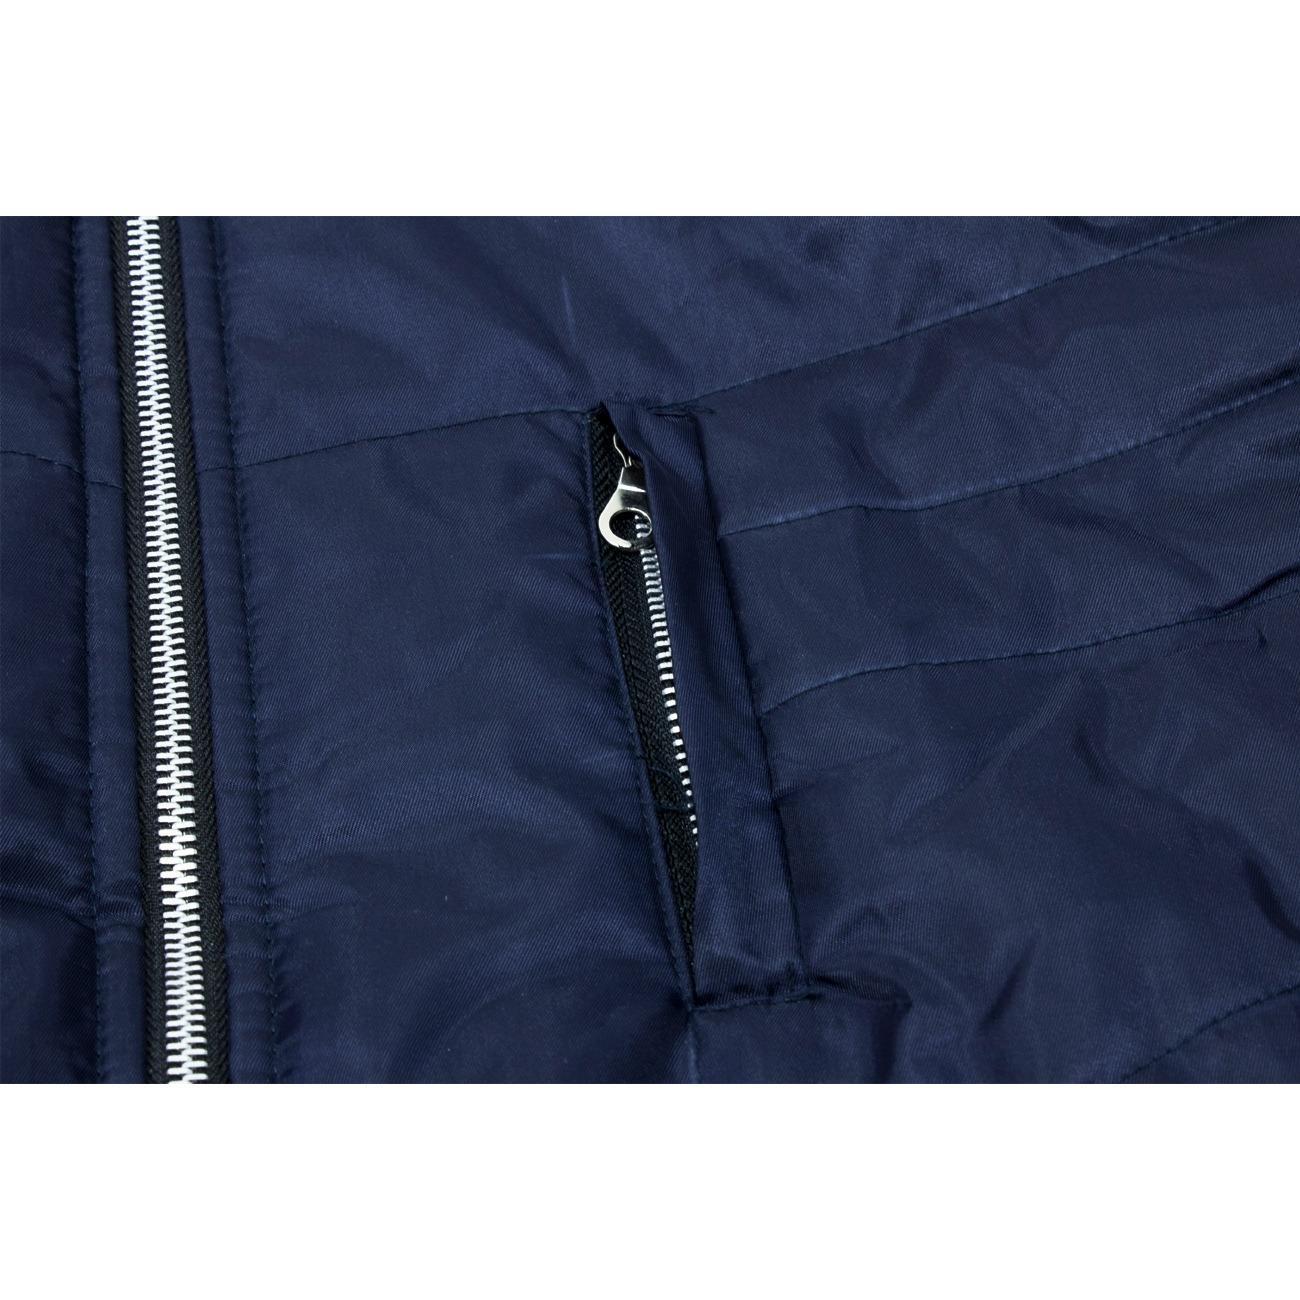 Cek Harga Baru Jaket Triton Biru Navy Polos Waterproof Distro Murah Zipper Keren Bagus Pria Tahan Angin Anti Air